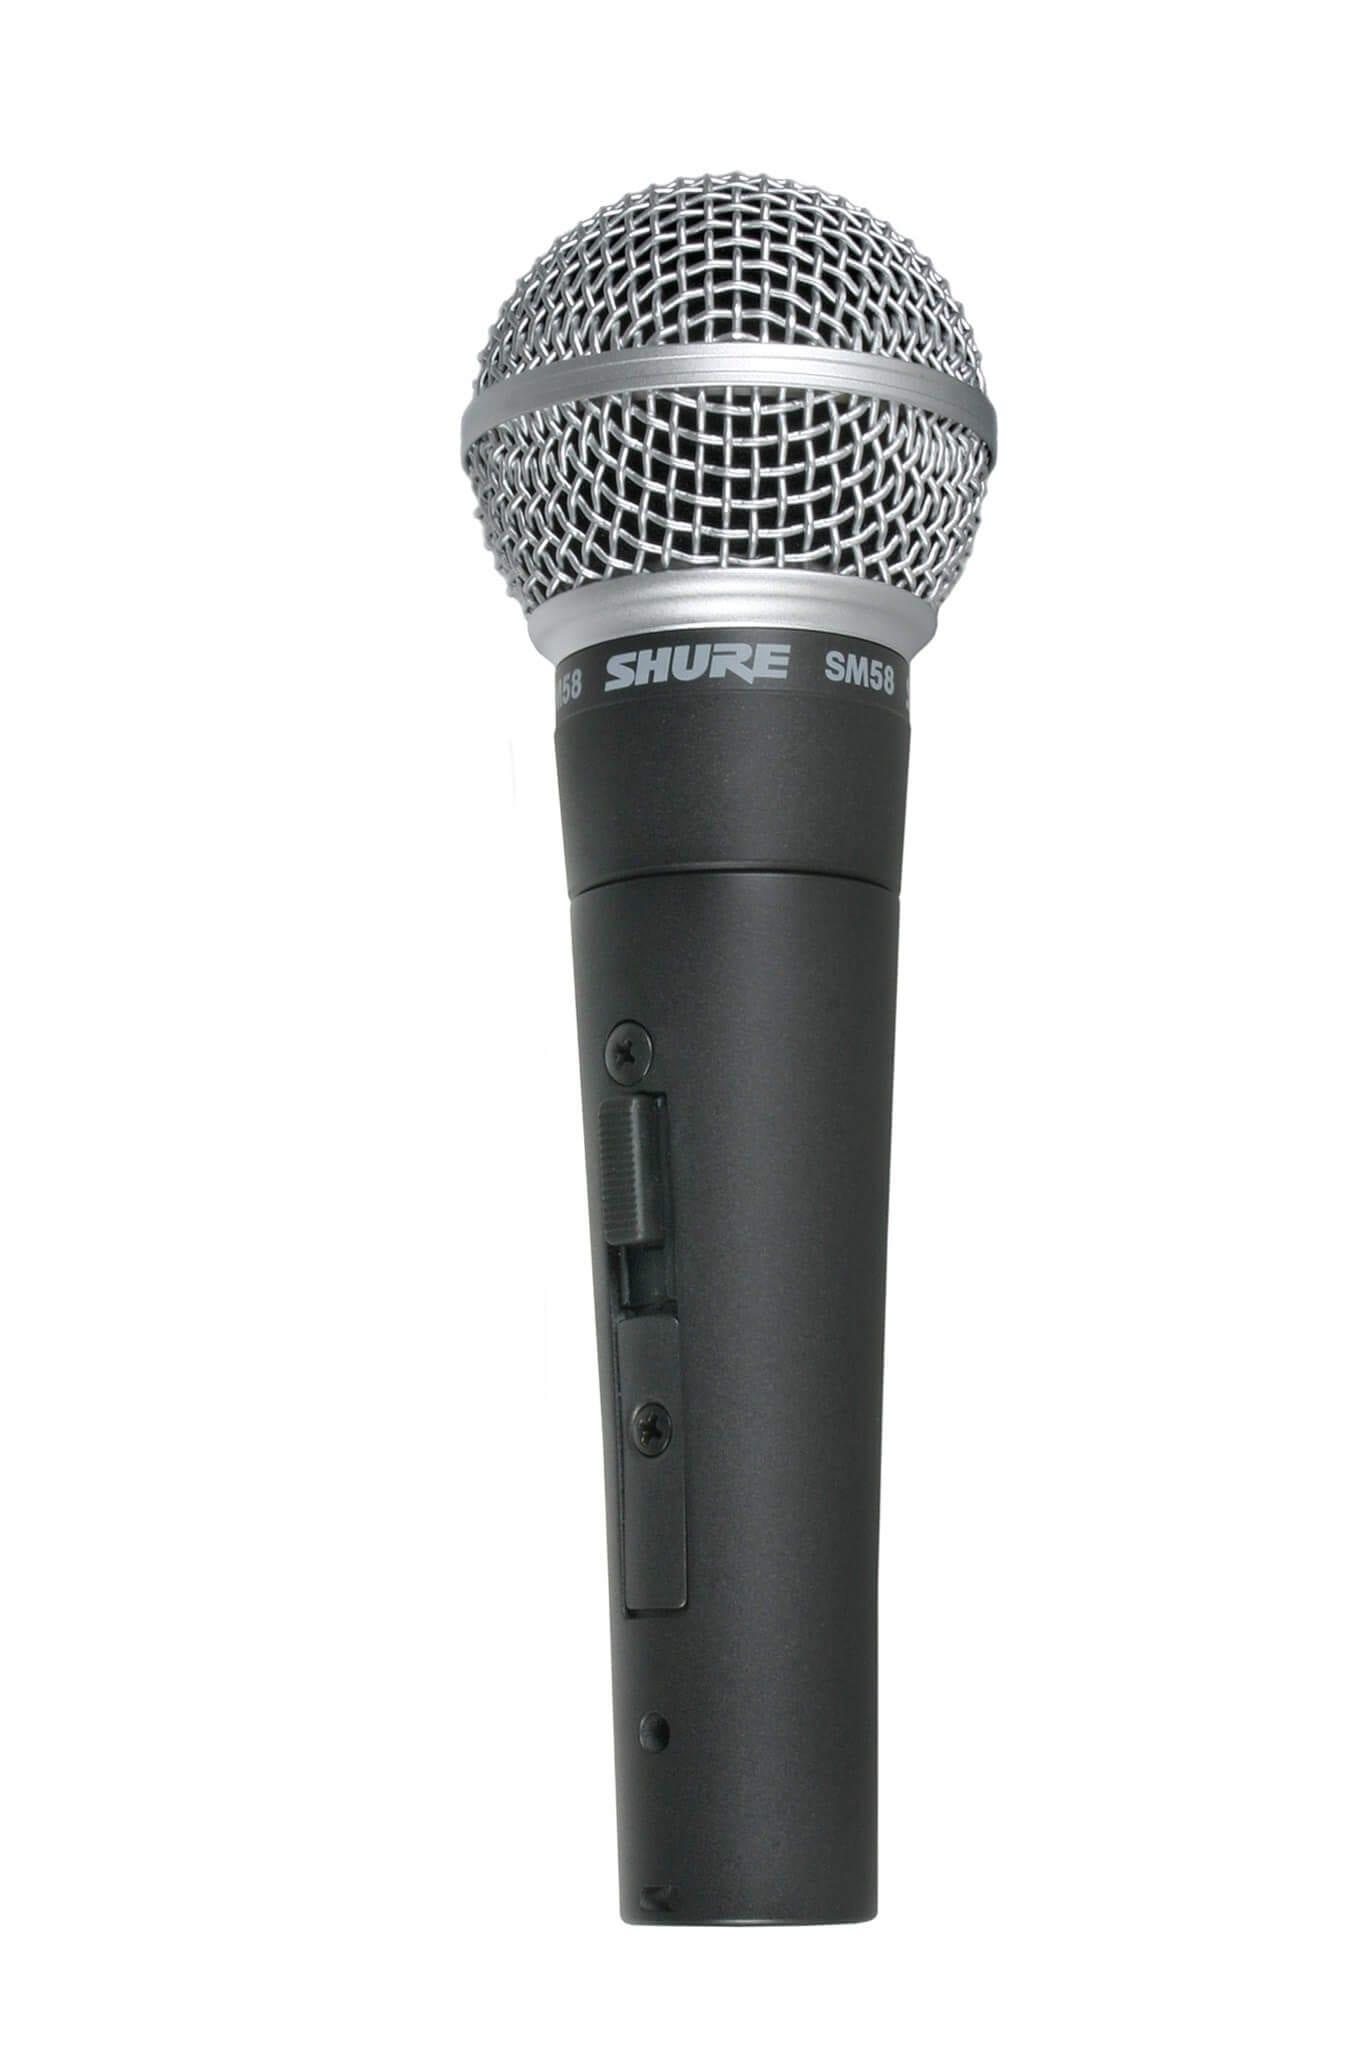 Shure SM58 Cardioid Dynamic Vocal Microphone - HyTek ...